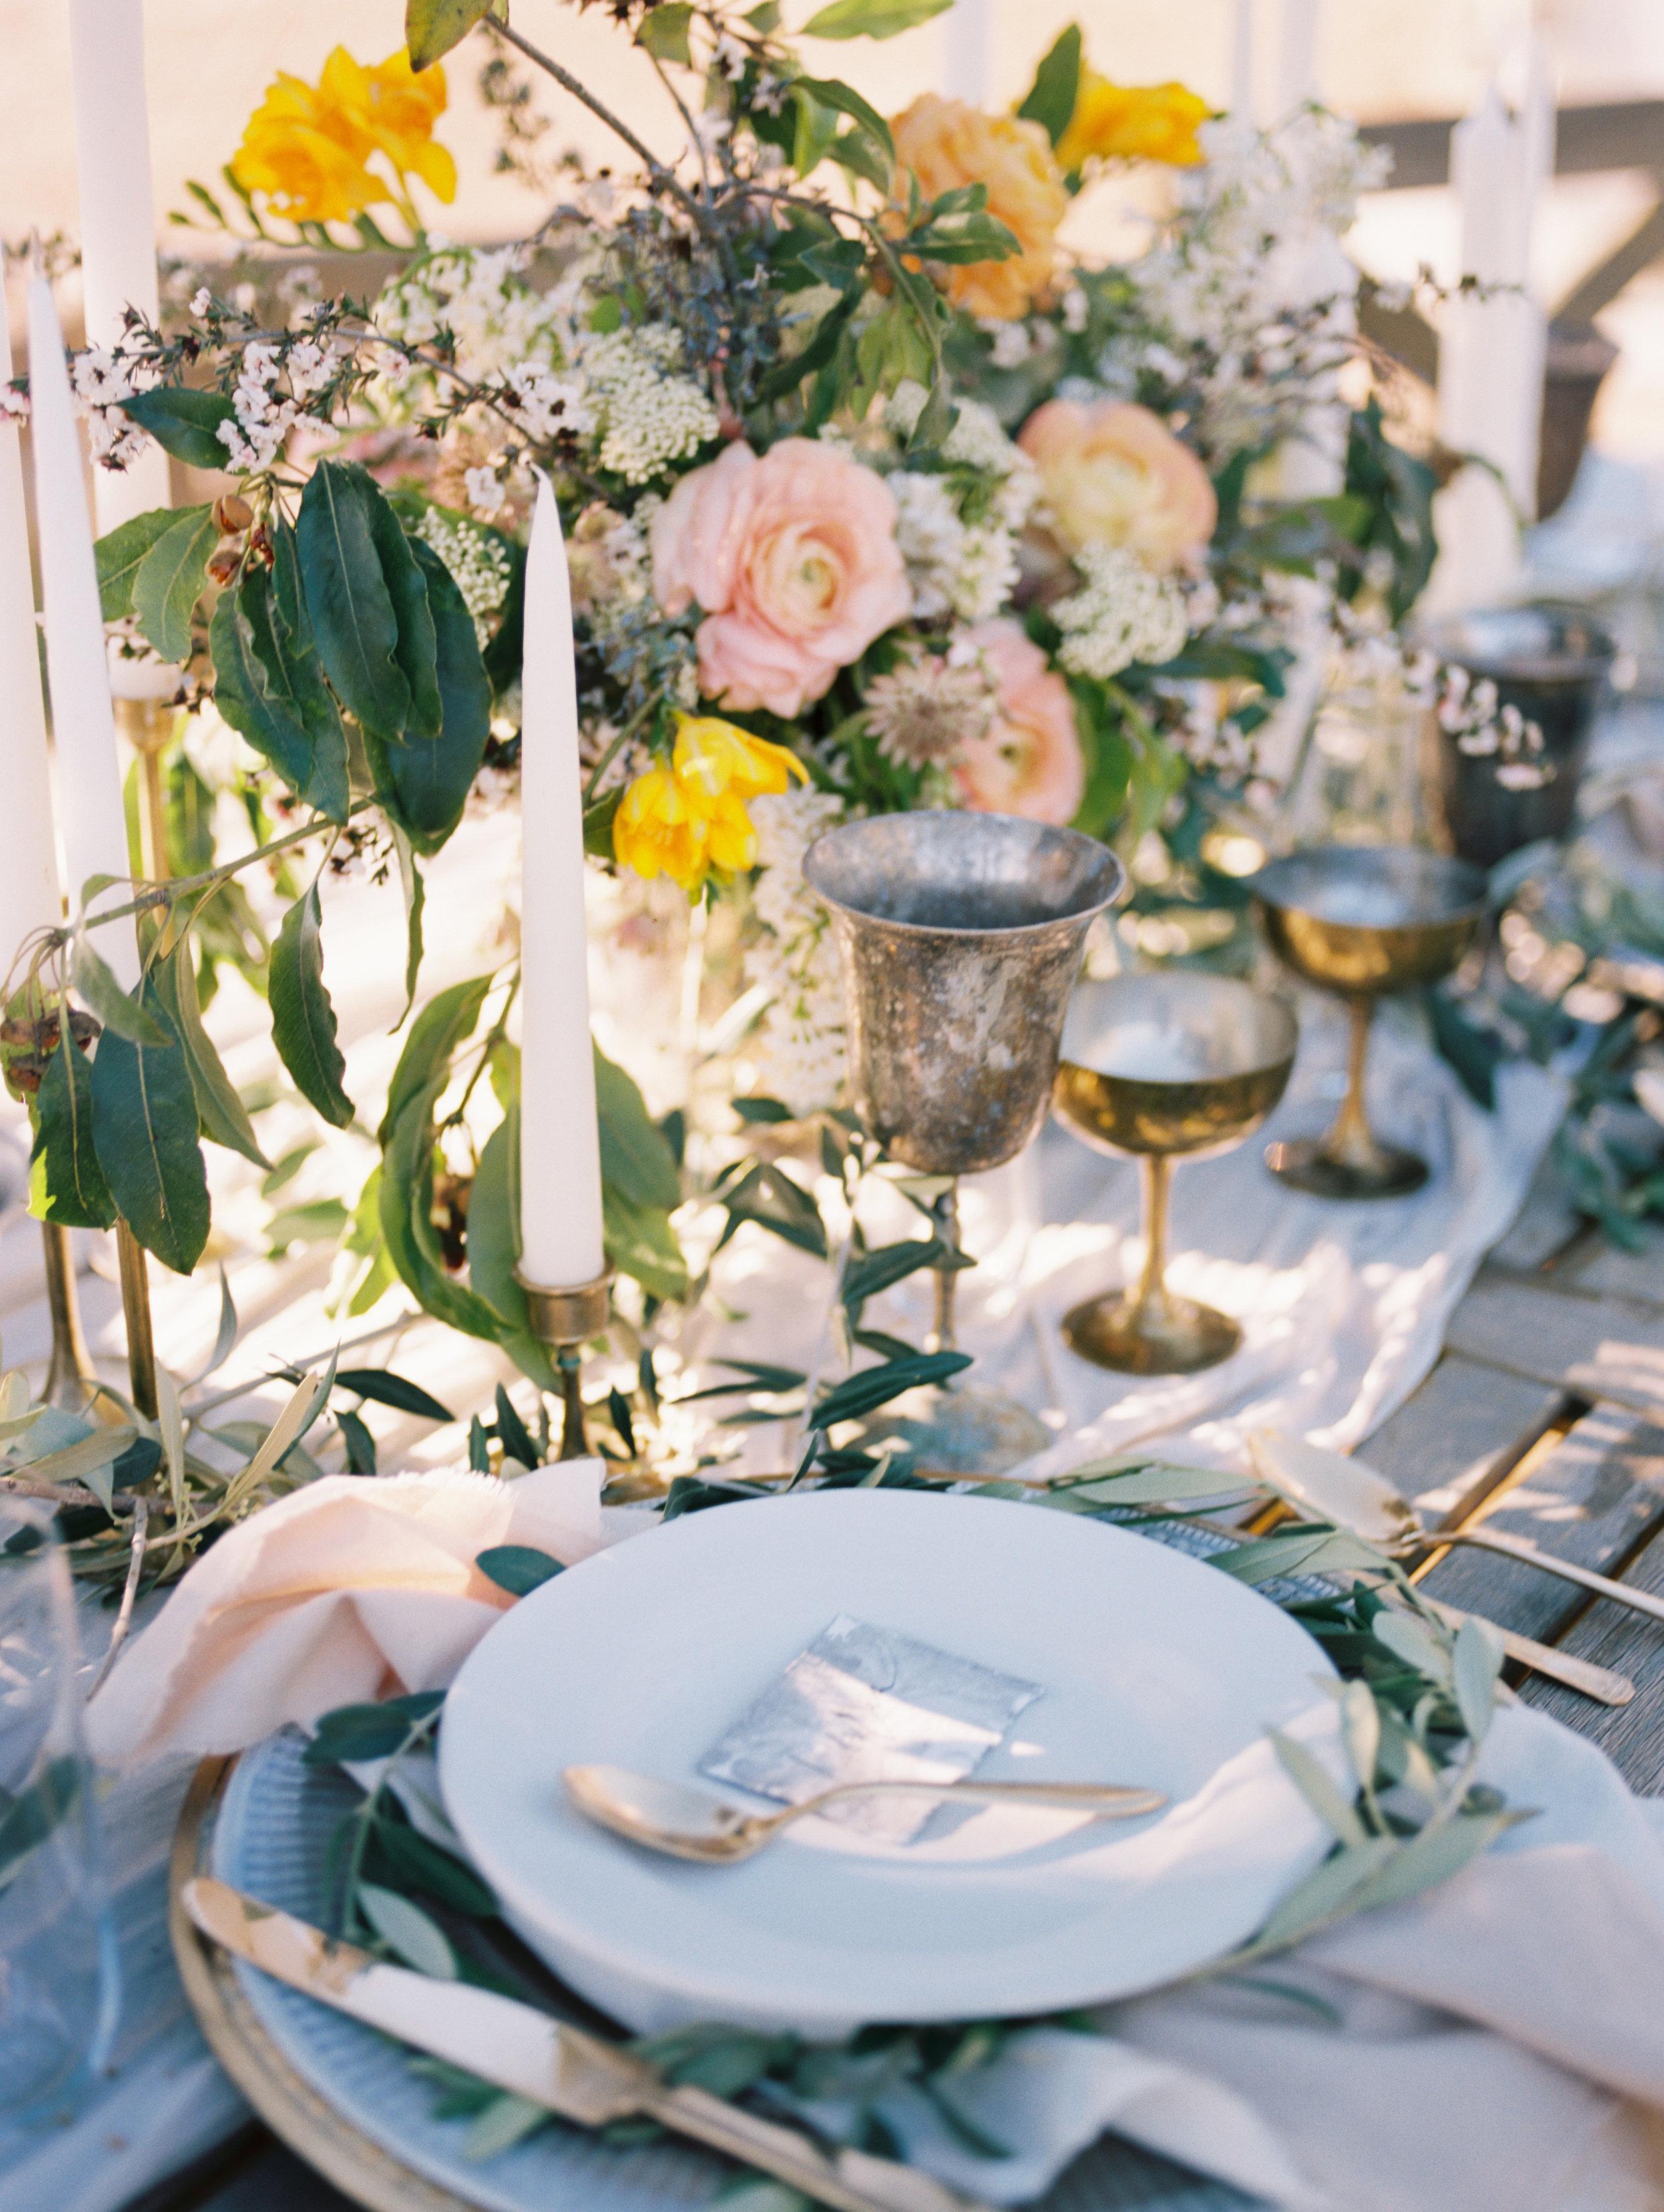 Olive Mill Wedding Inspiration - Fine Art Reception Table